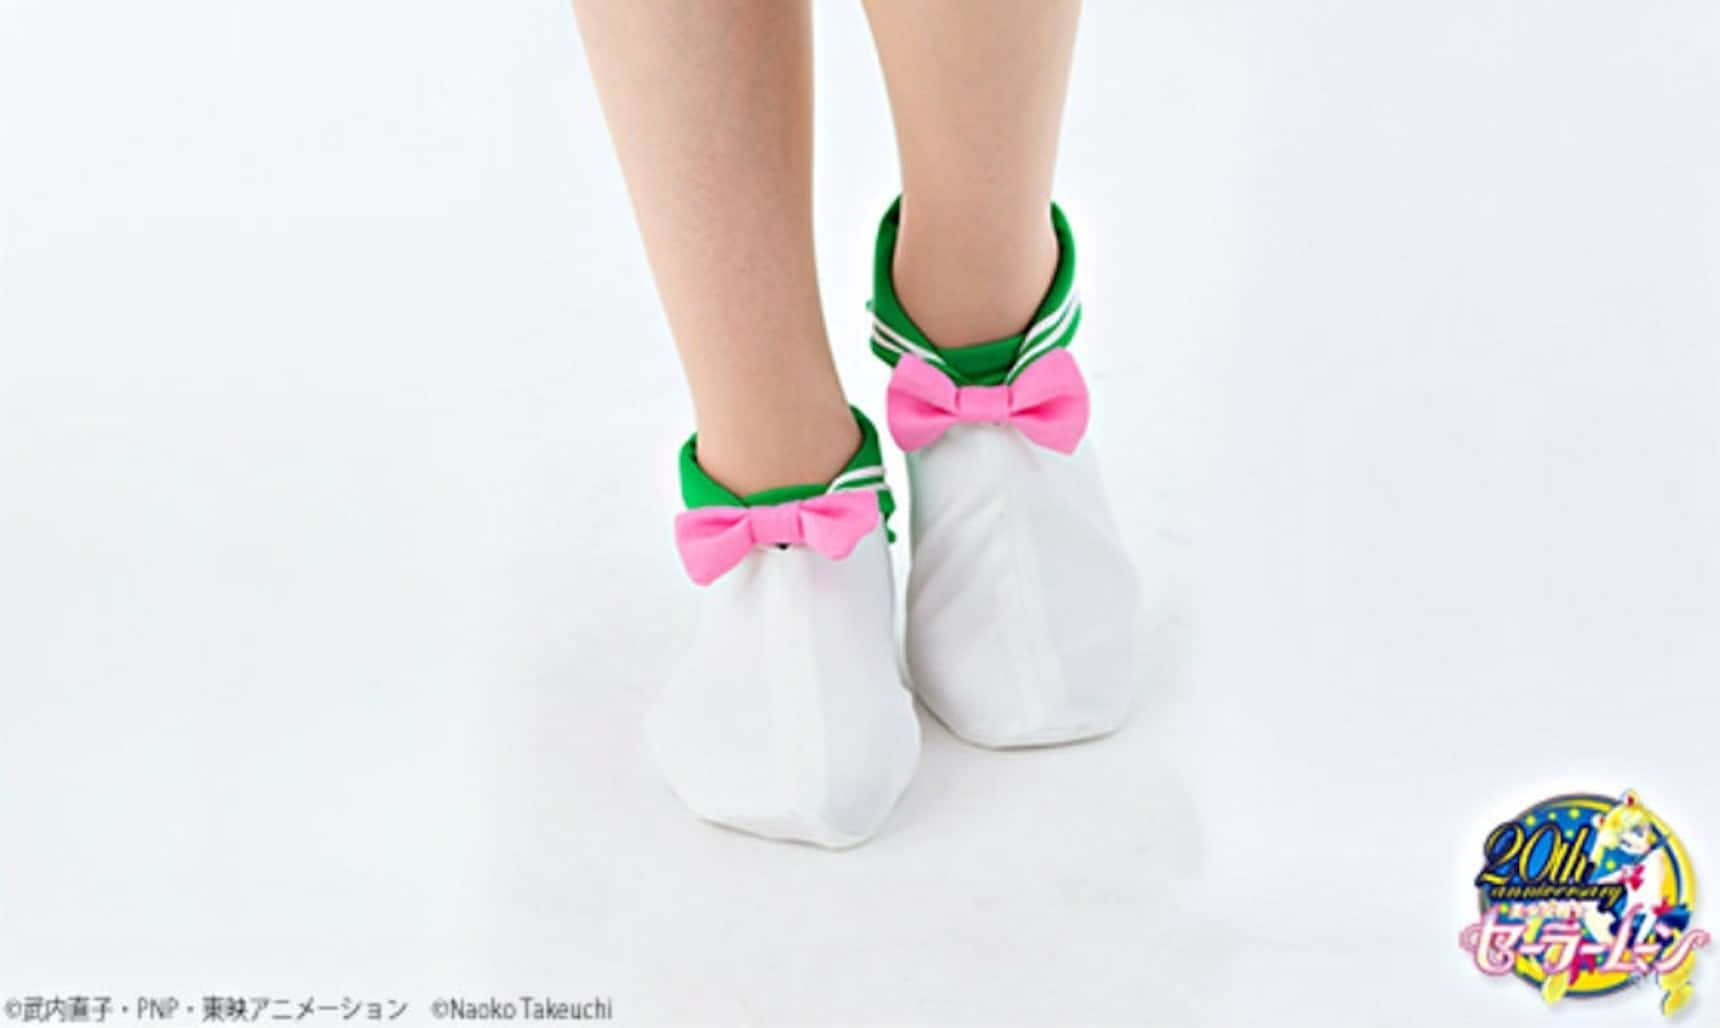 Slip on a Pair of Sailor Moon Socks